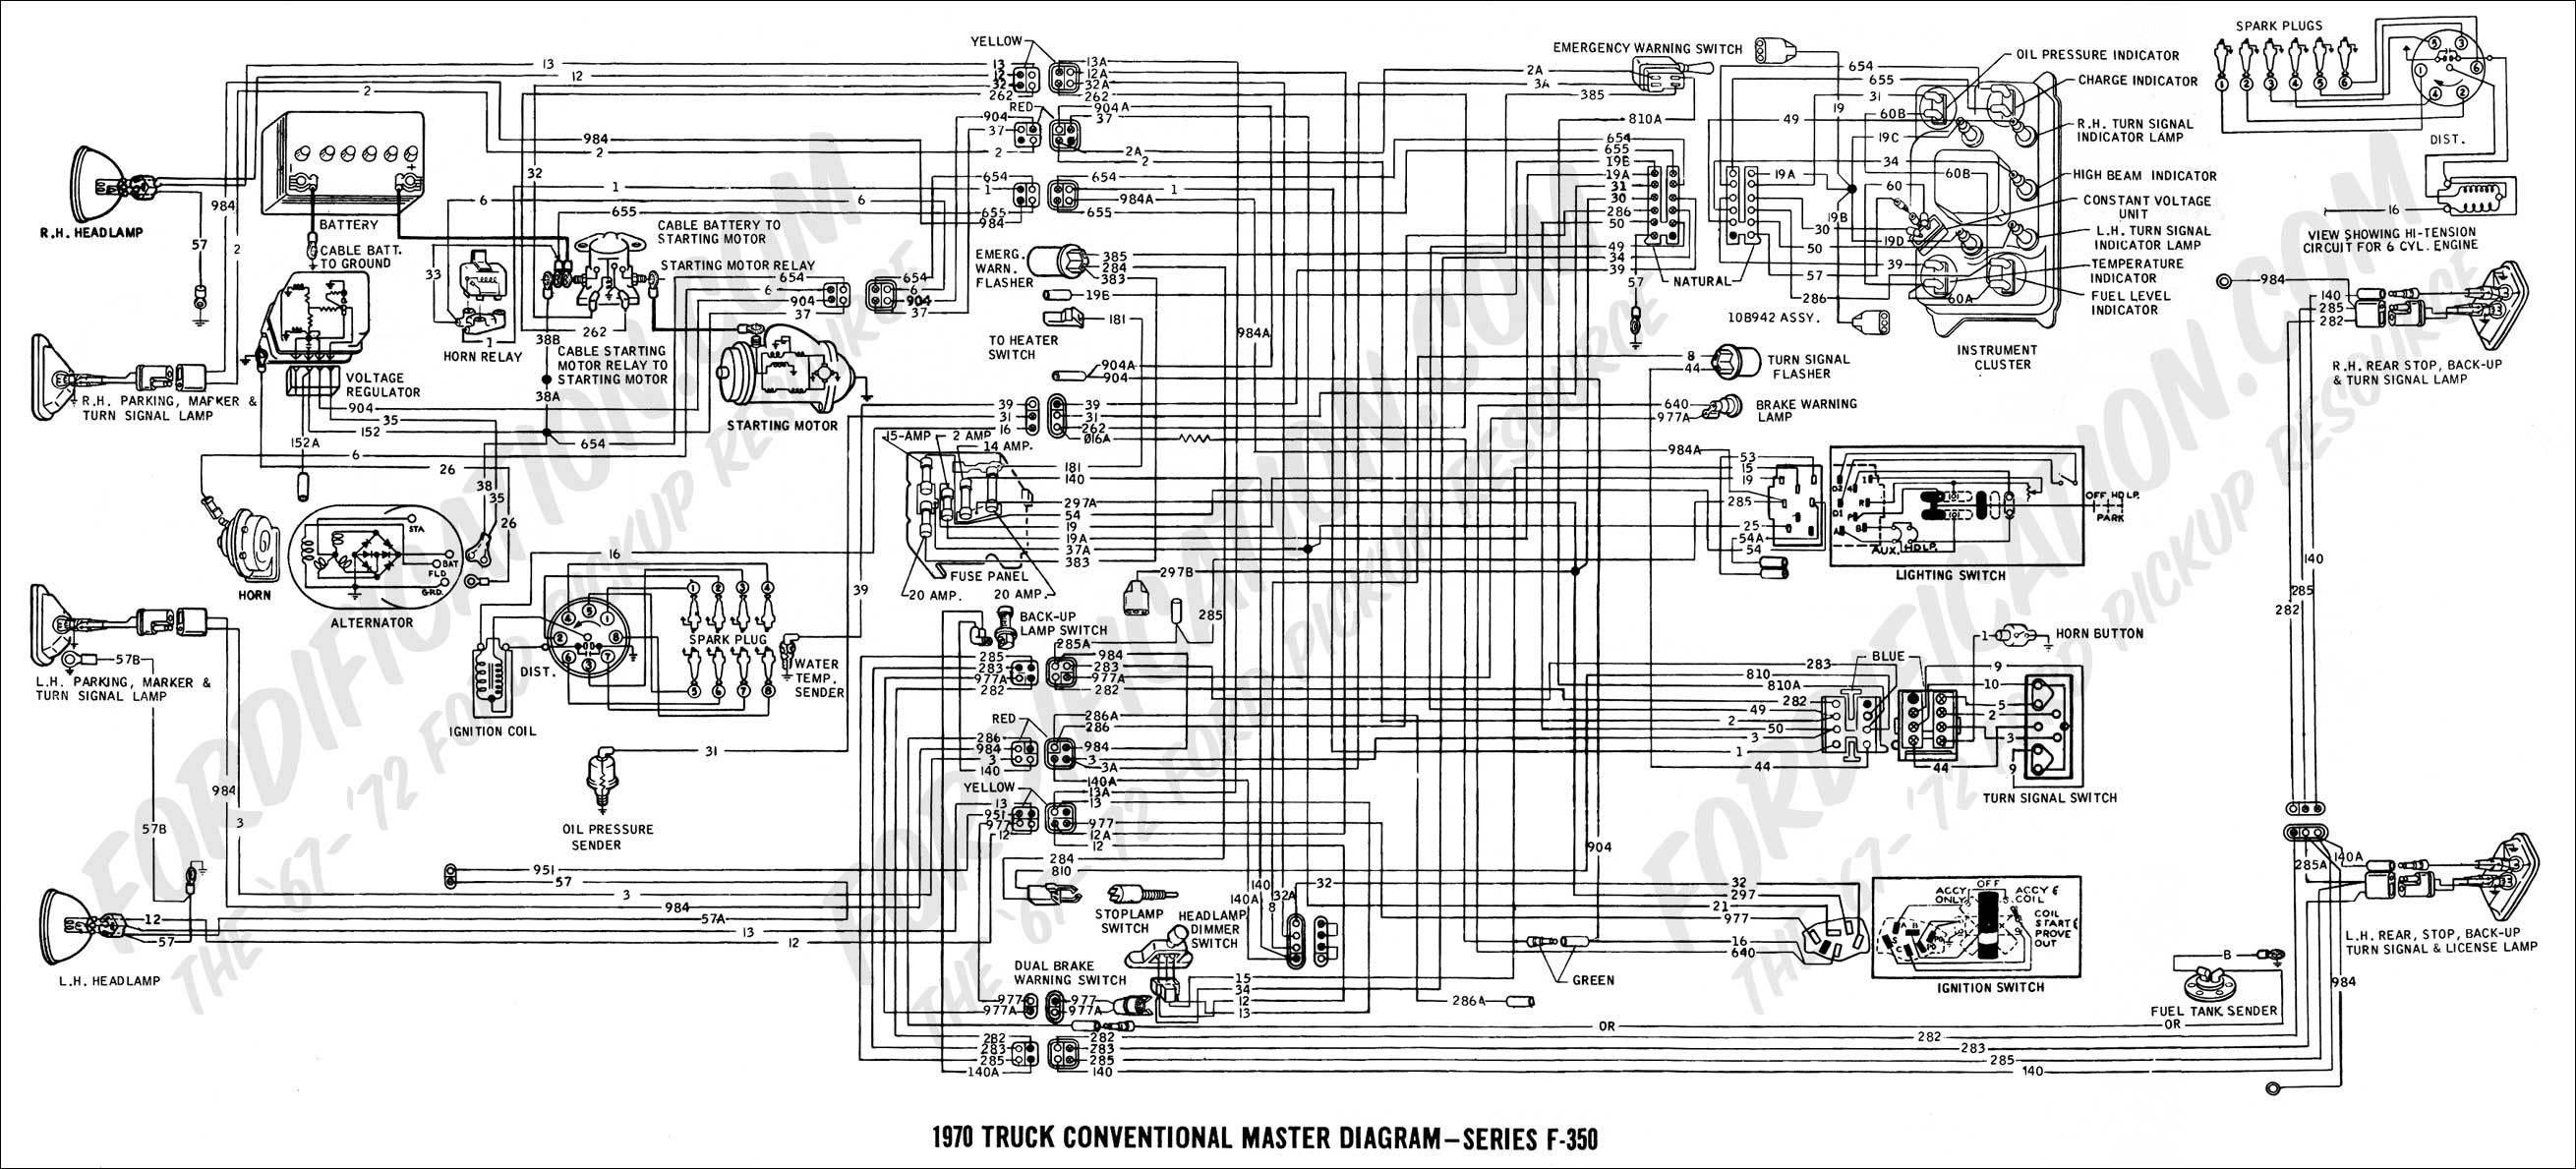 Electrical Switch Diagram Elegant Peterbilt Wiring Diagram 389